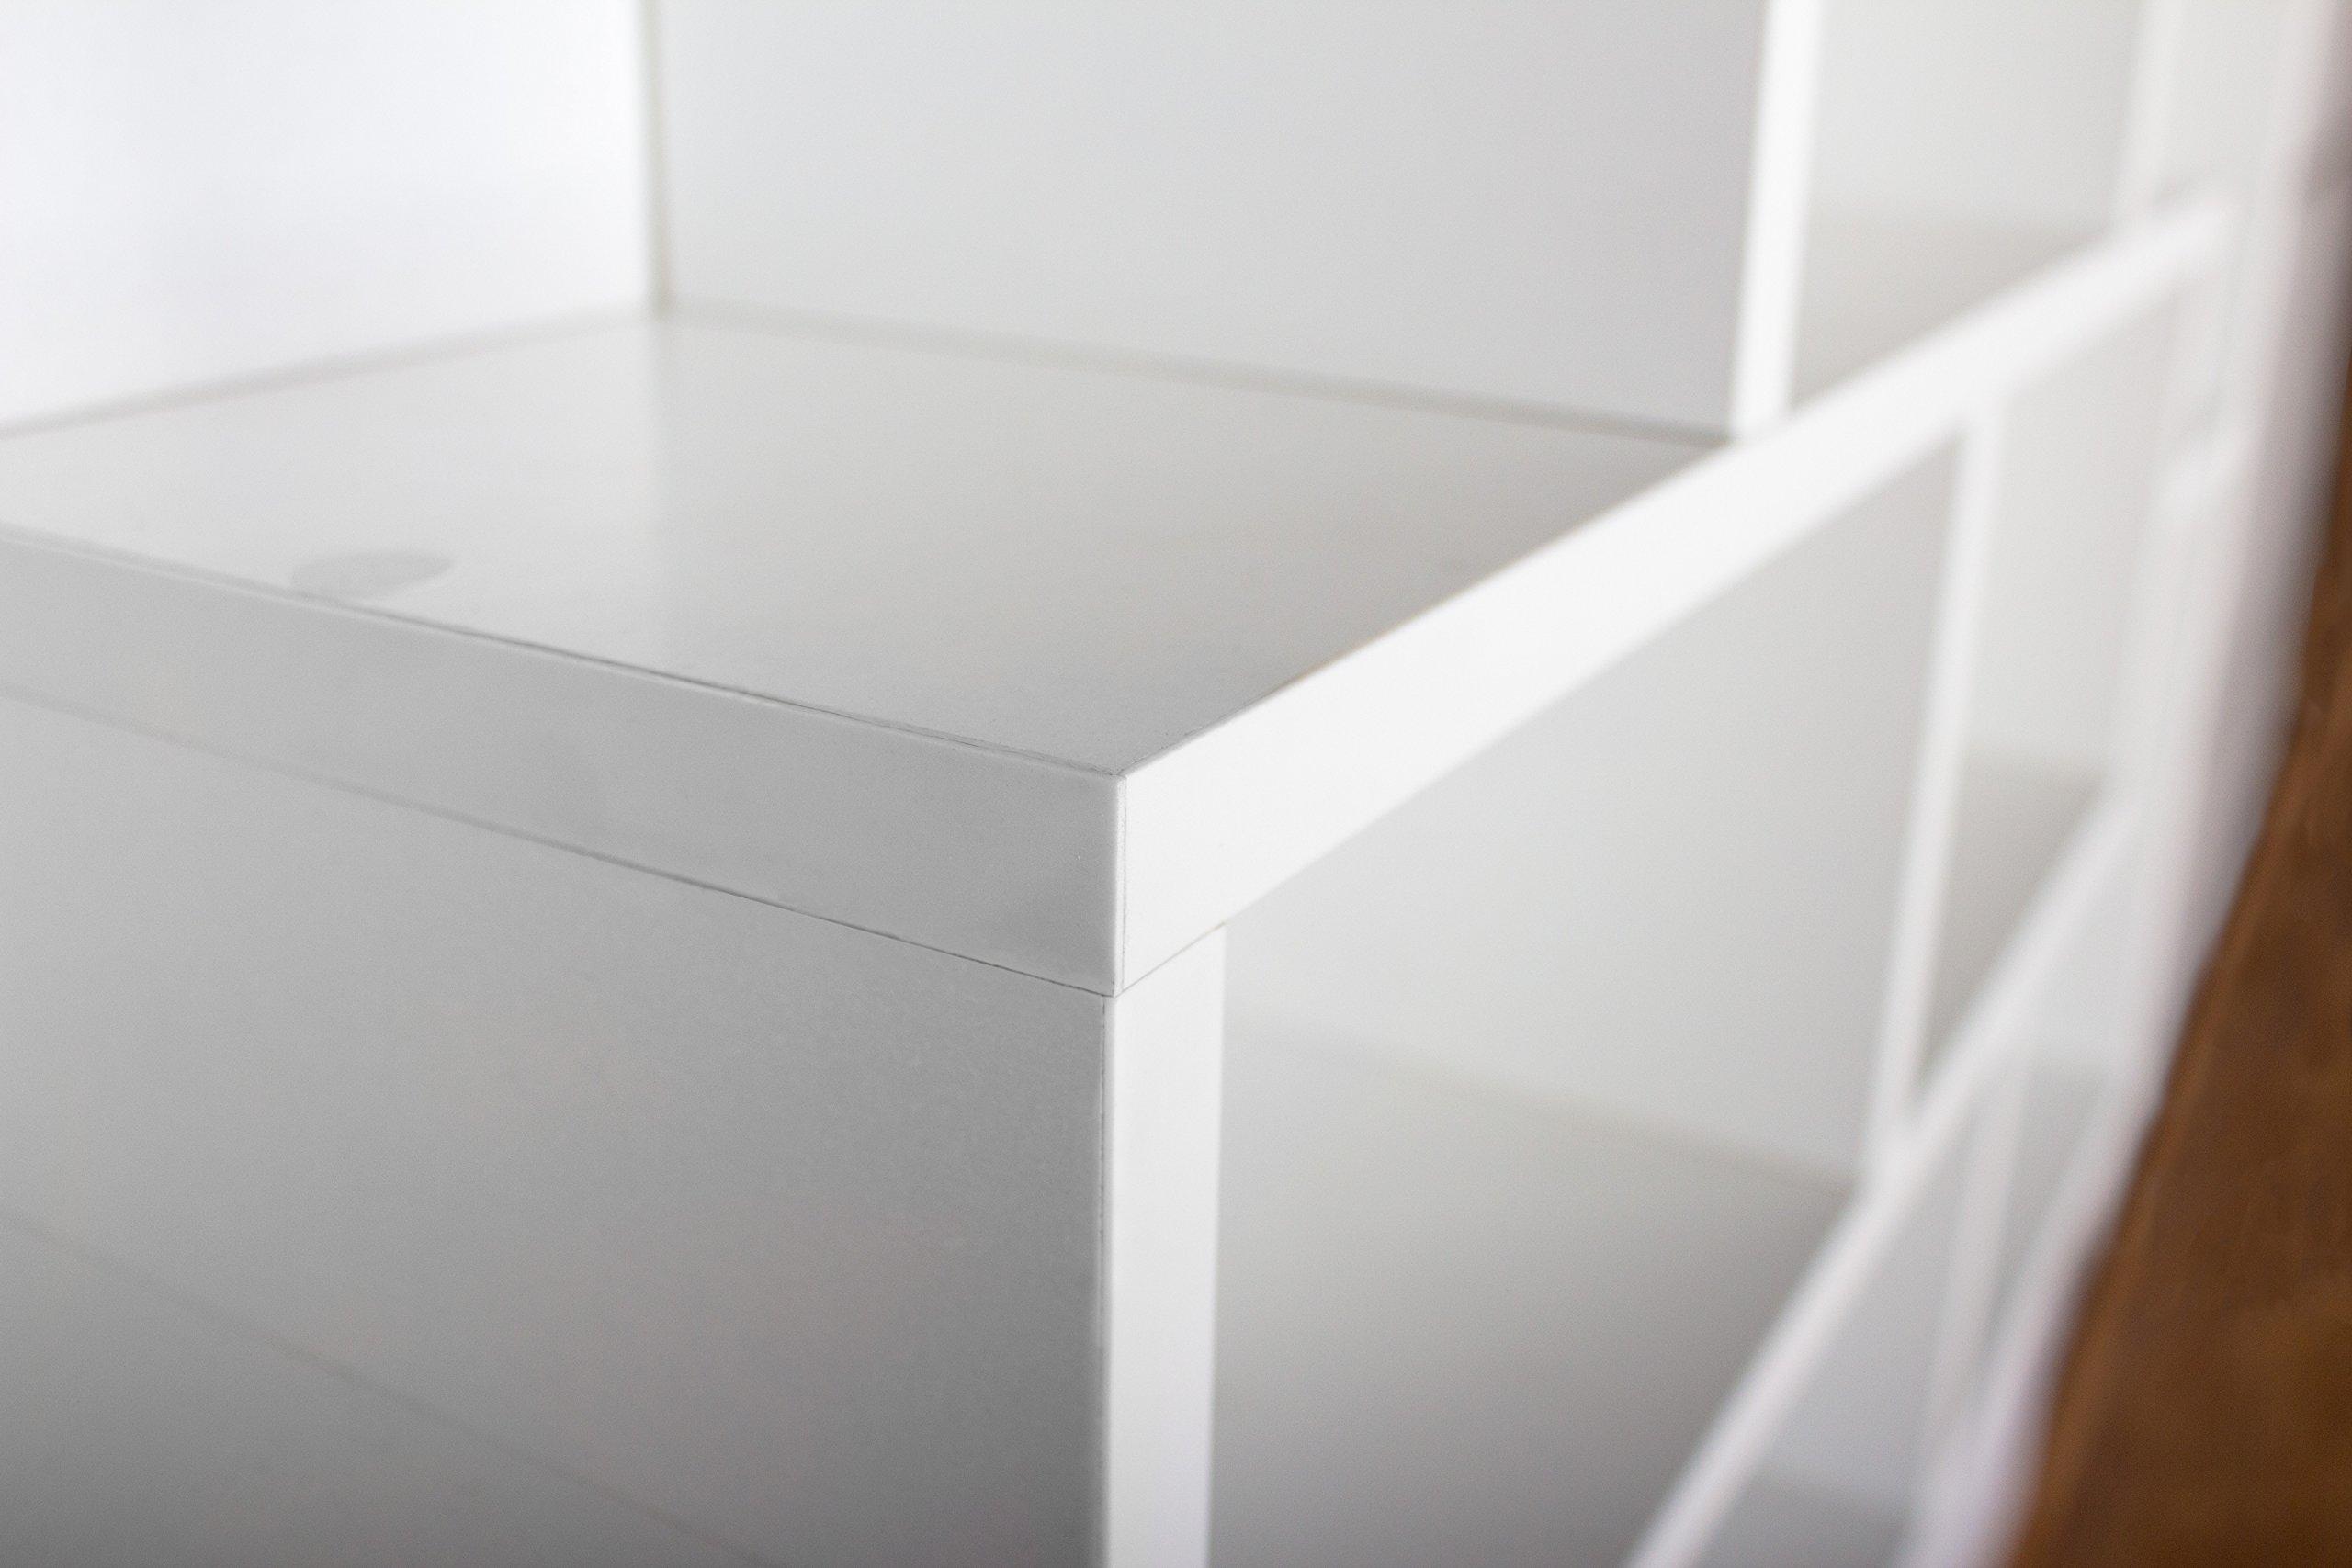 Kühlschrank Hängeregal : Kühlschrank hängeregal sobuy hängeregal für kühlschrank türregal